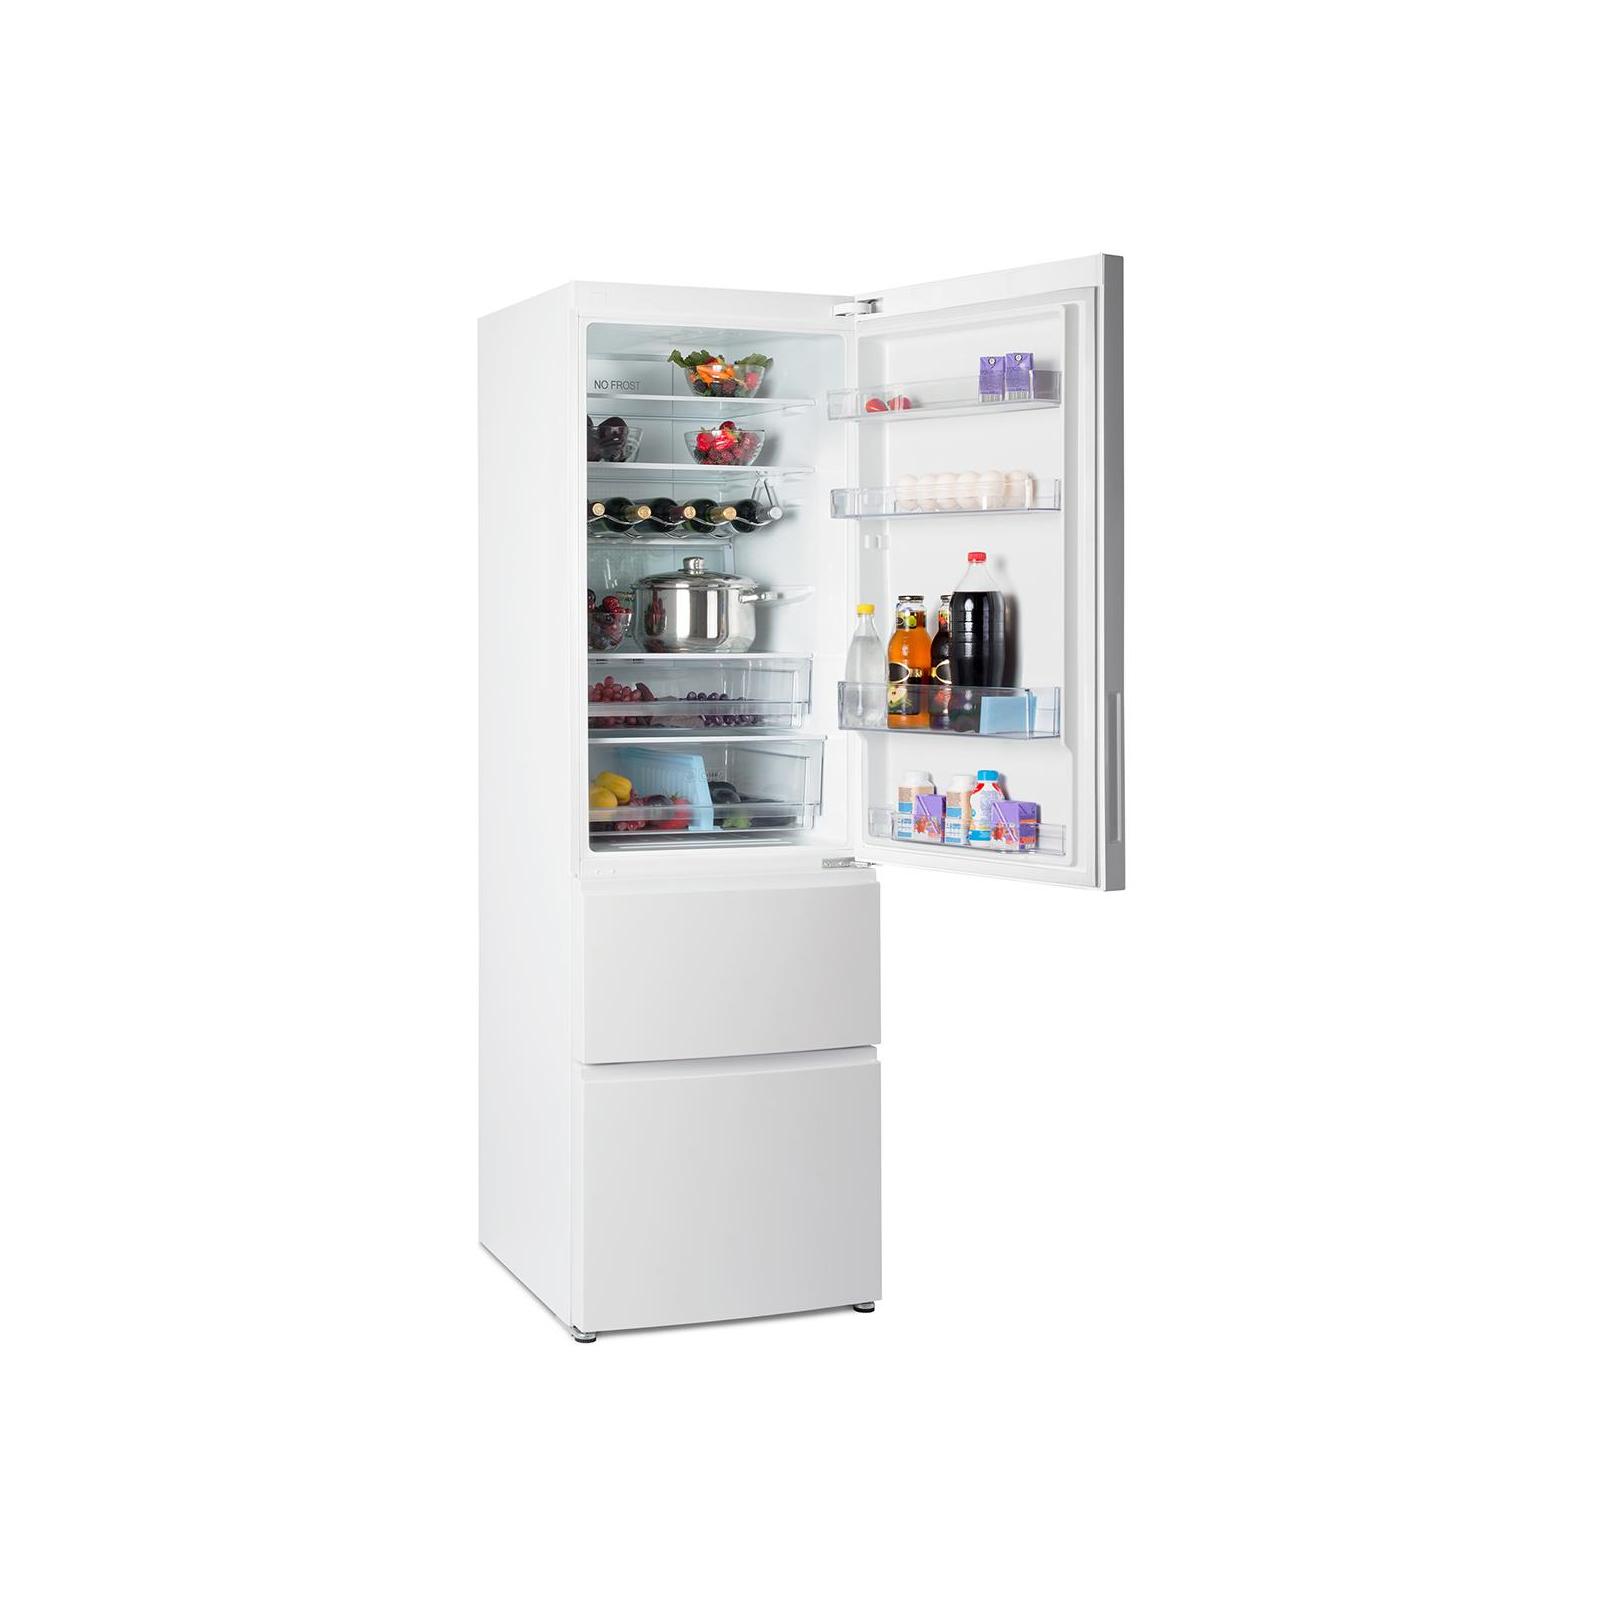 Холодильник Haier HA A2F635CWMV изображение 4